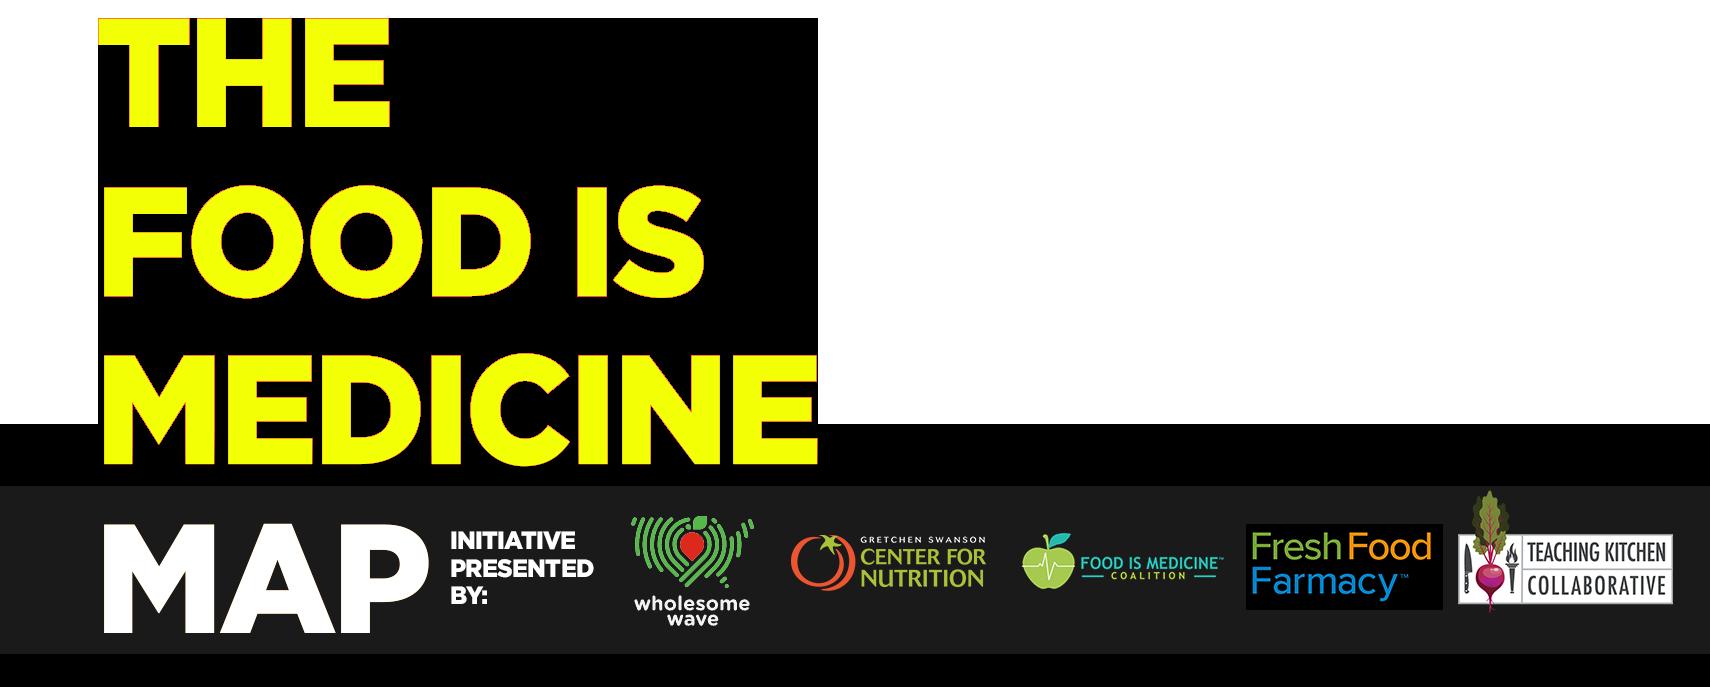 Food is Medicine Map logo with partner logos